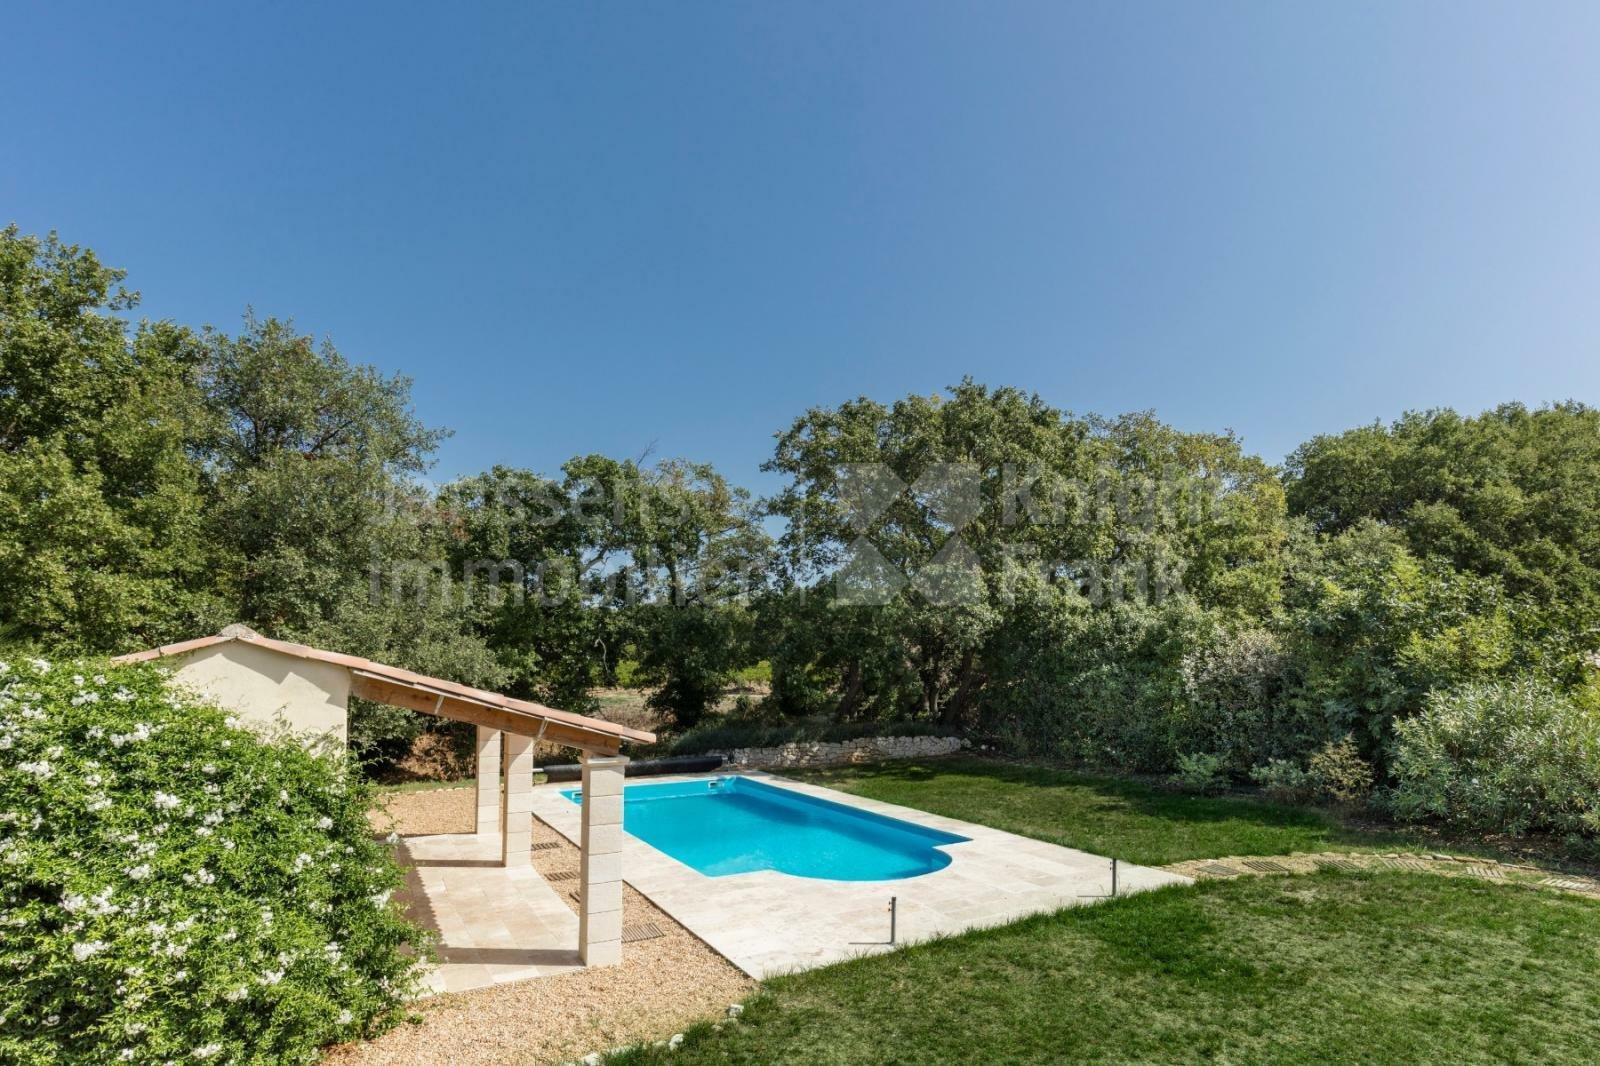 Villa in Oppède, Provence-Alpes-Côte d'Azur, France 1